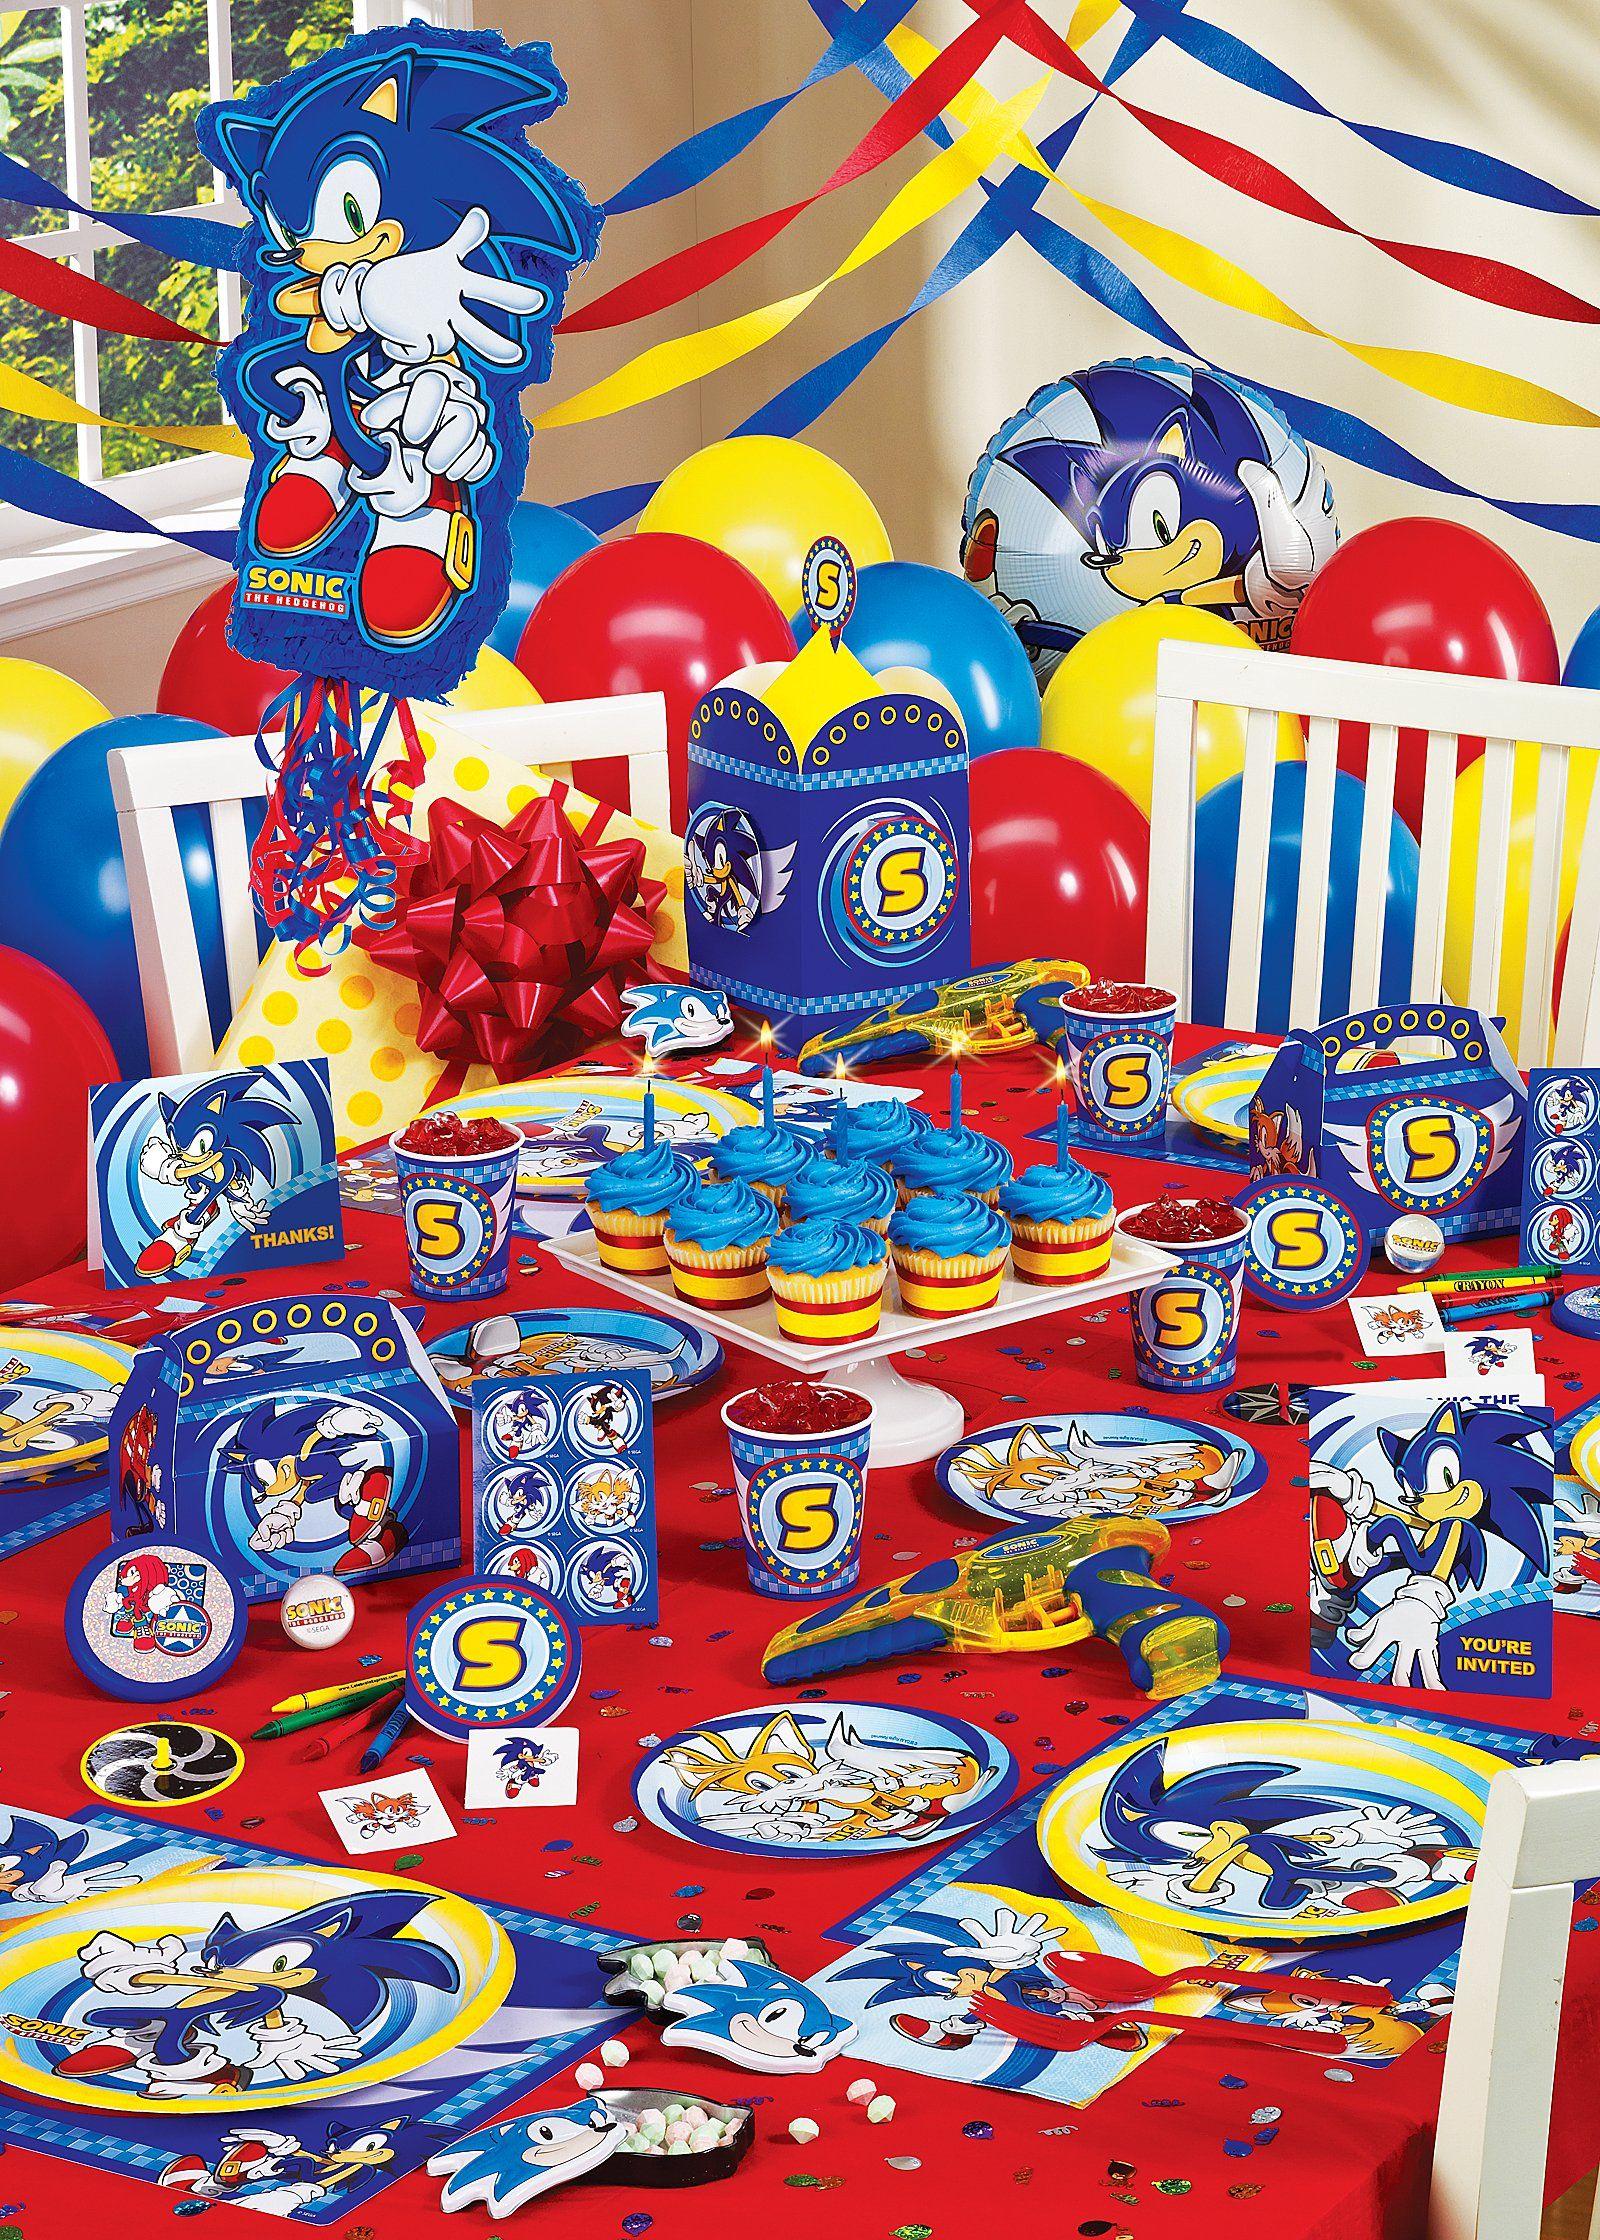 Sonic The Hedgehog 16 Guest Party Pack Fiesta De Sonic Fiestas De Cumpleanos De Sonic Cumpleanos De Sonic